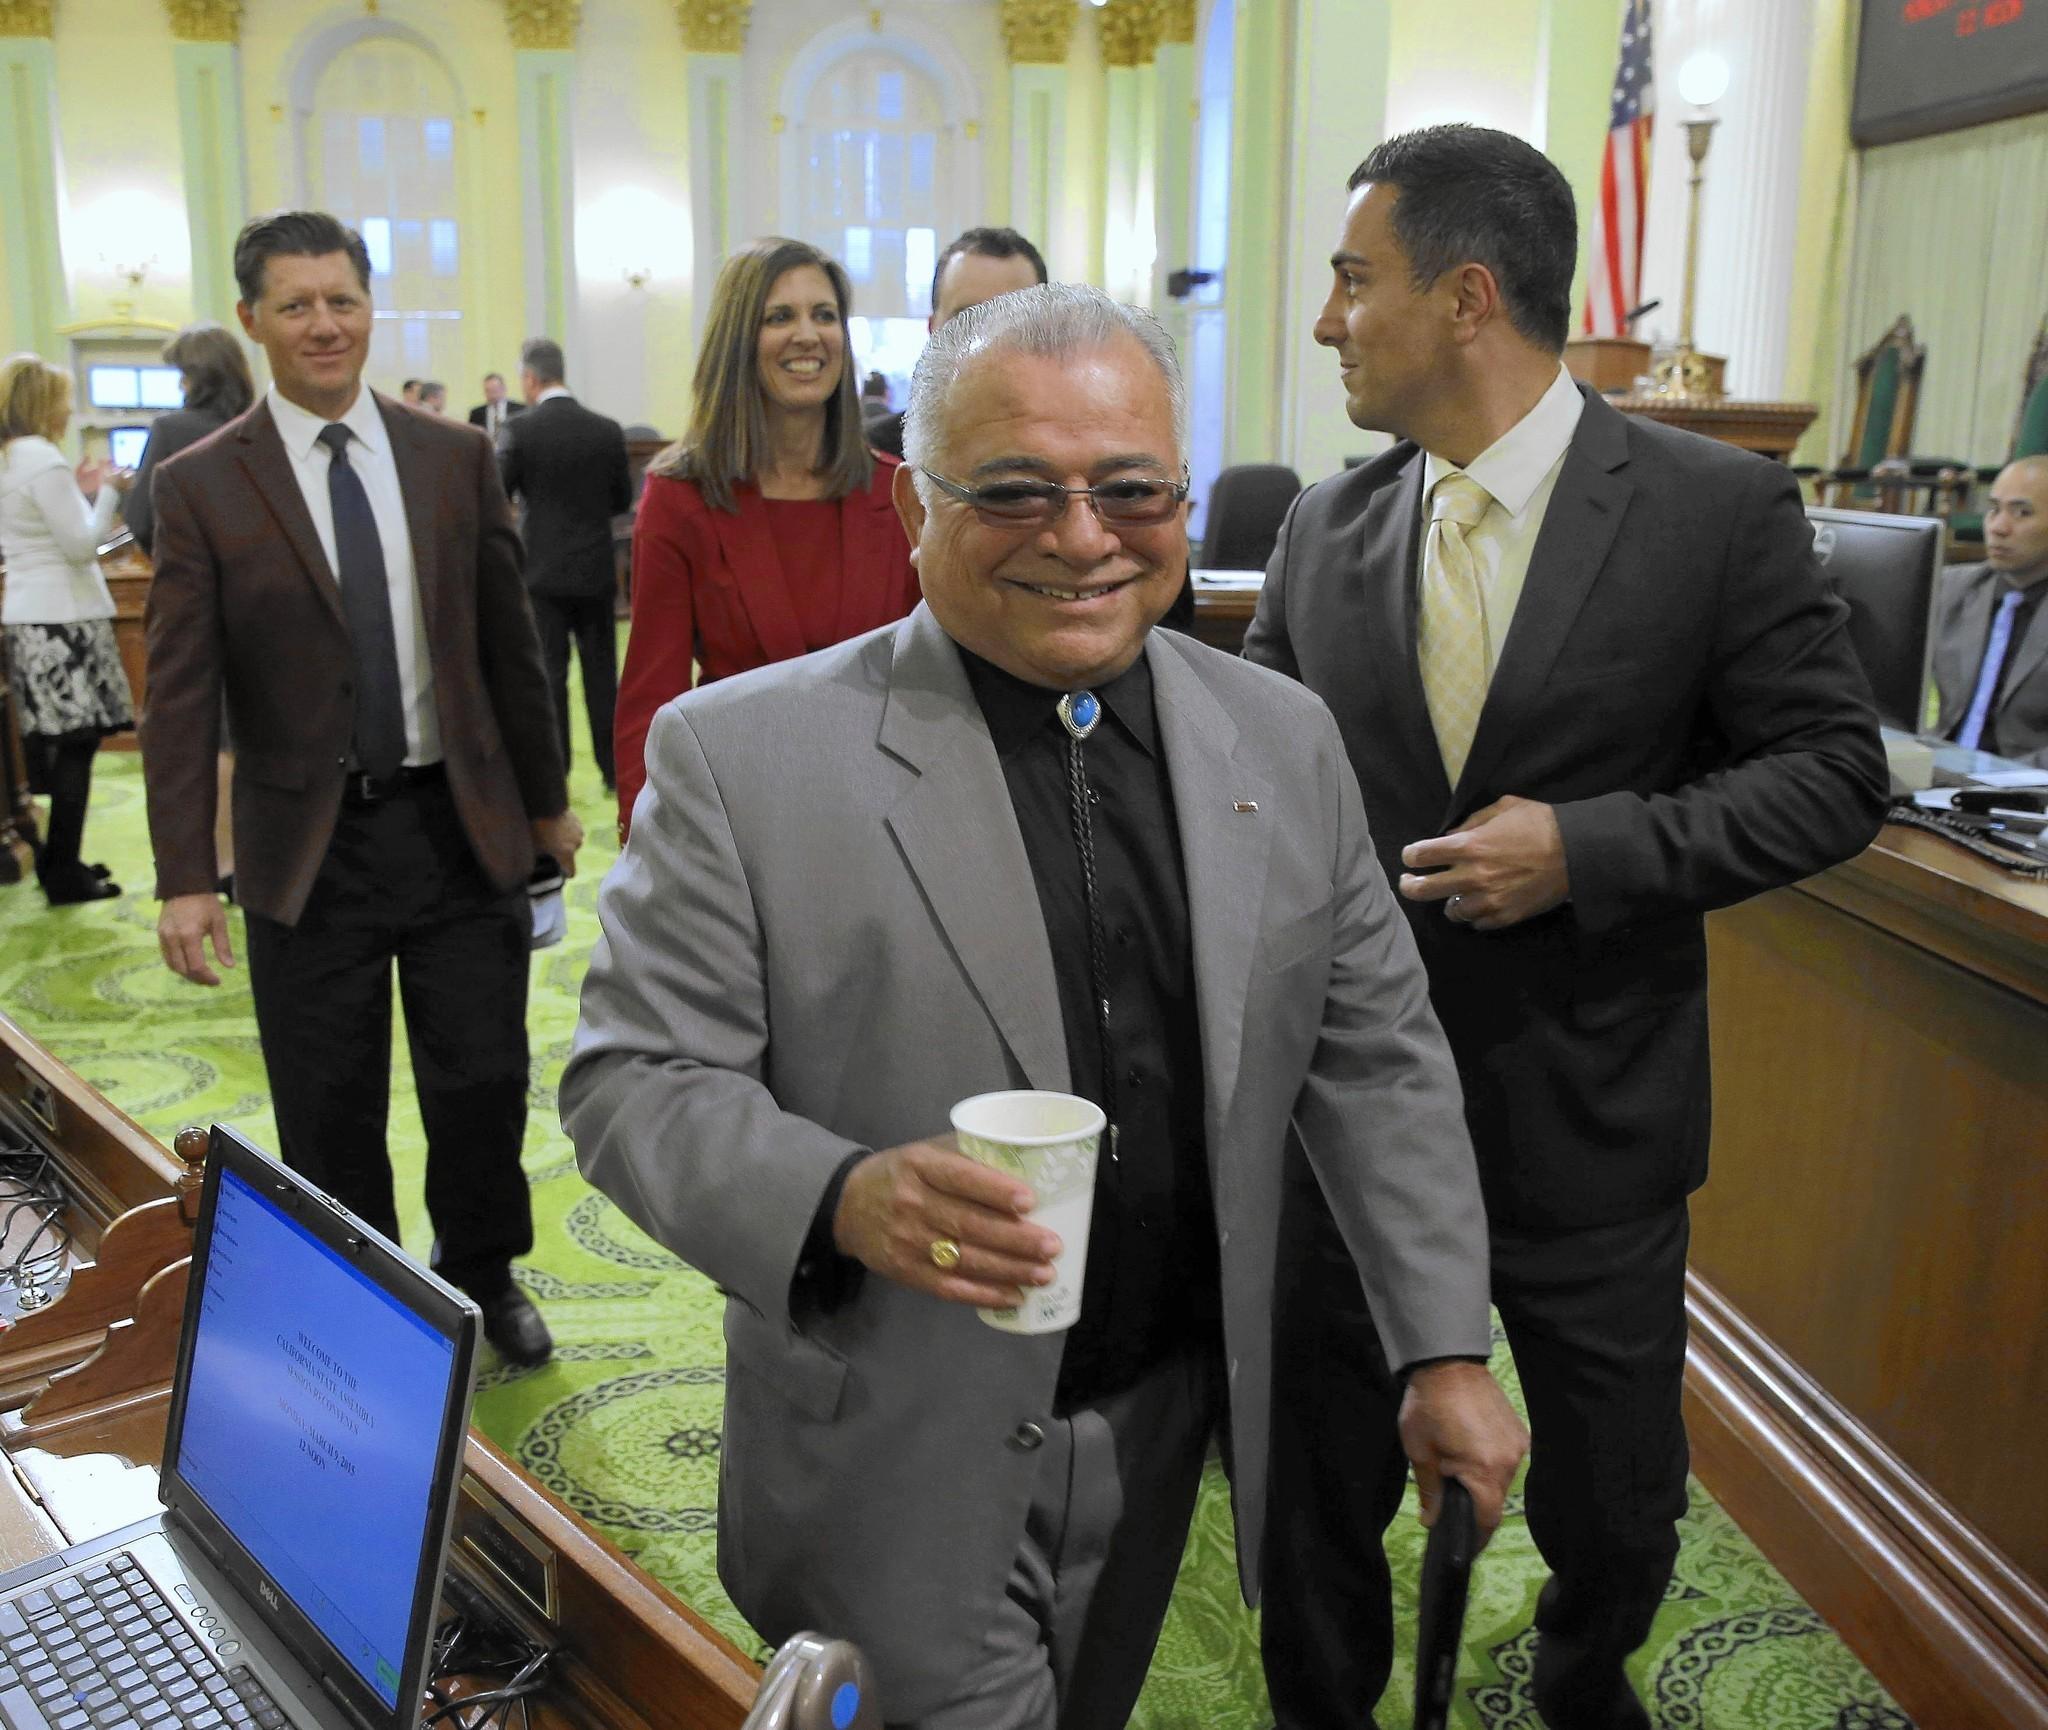 Rocky Chávez cites Marine background as key asset in U.S. Senate race